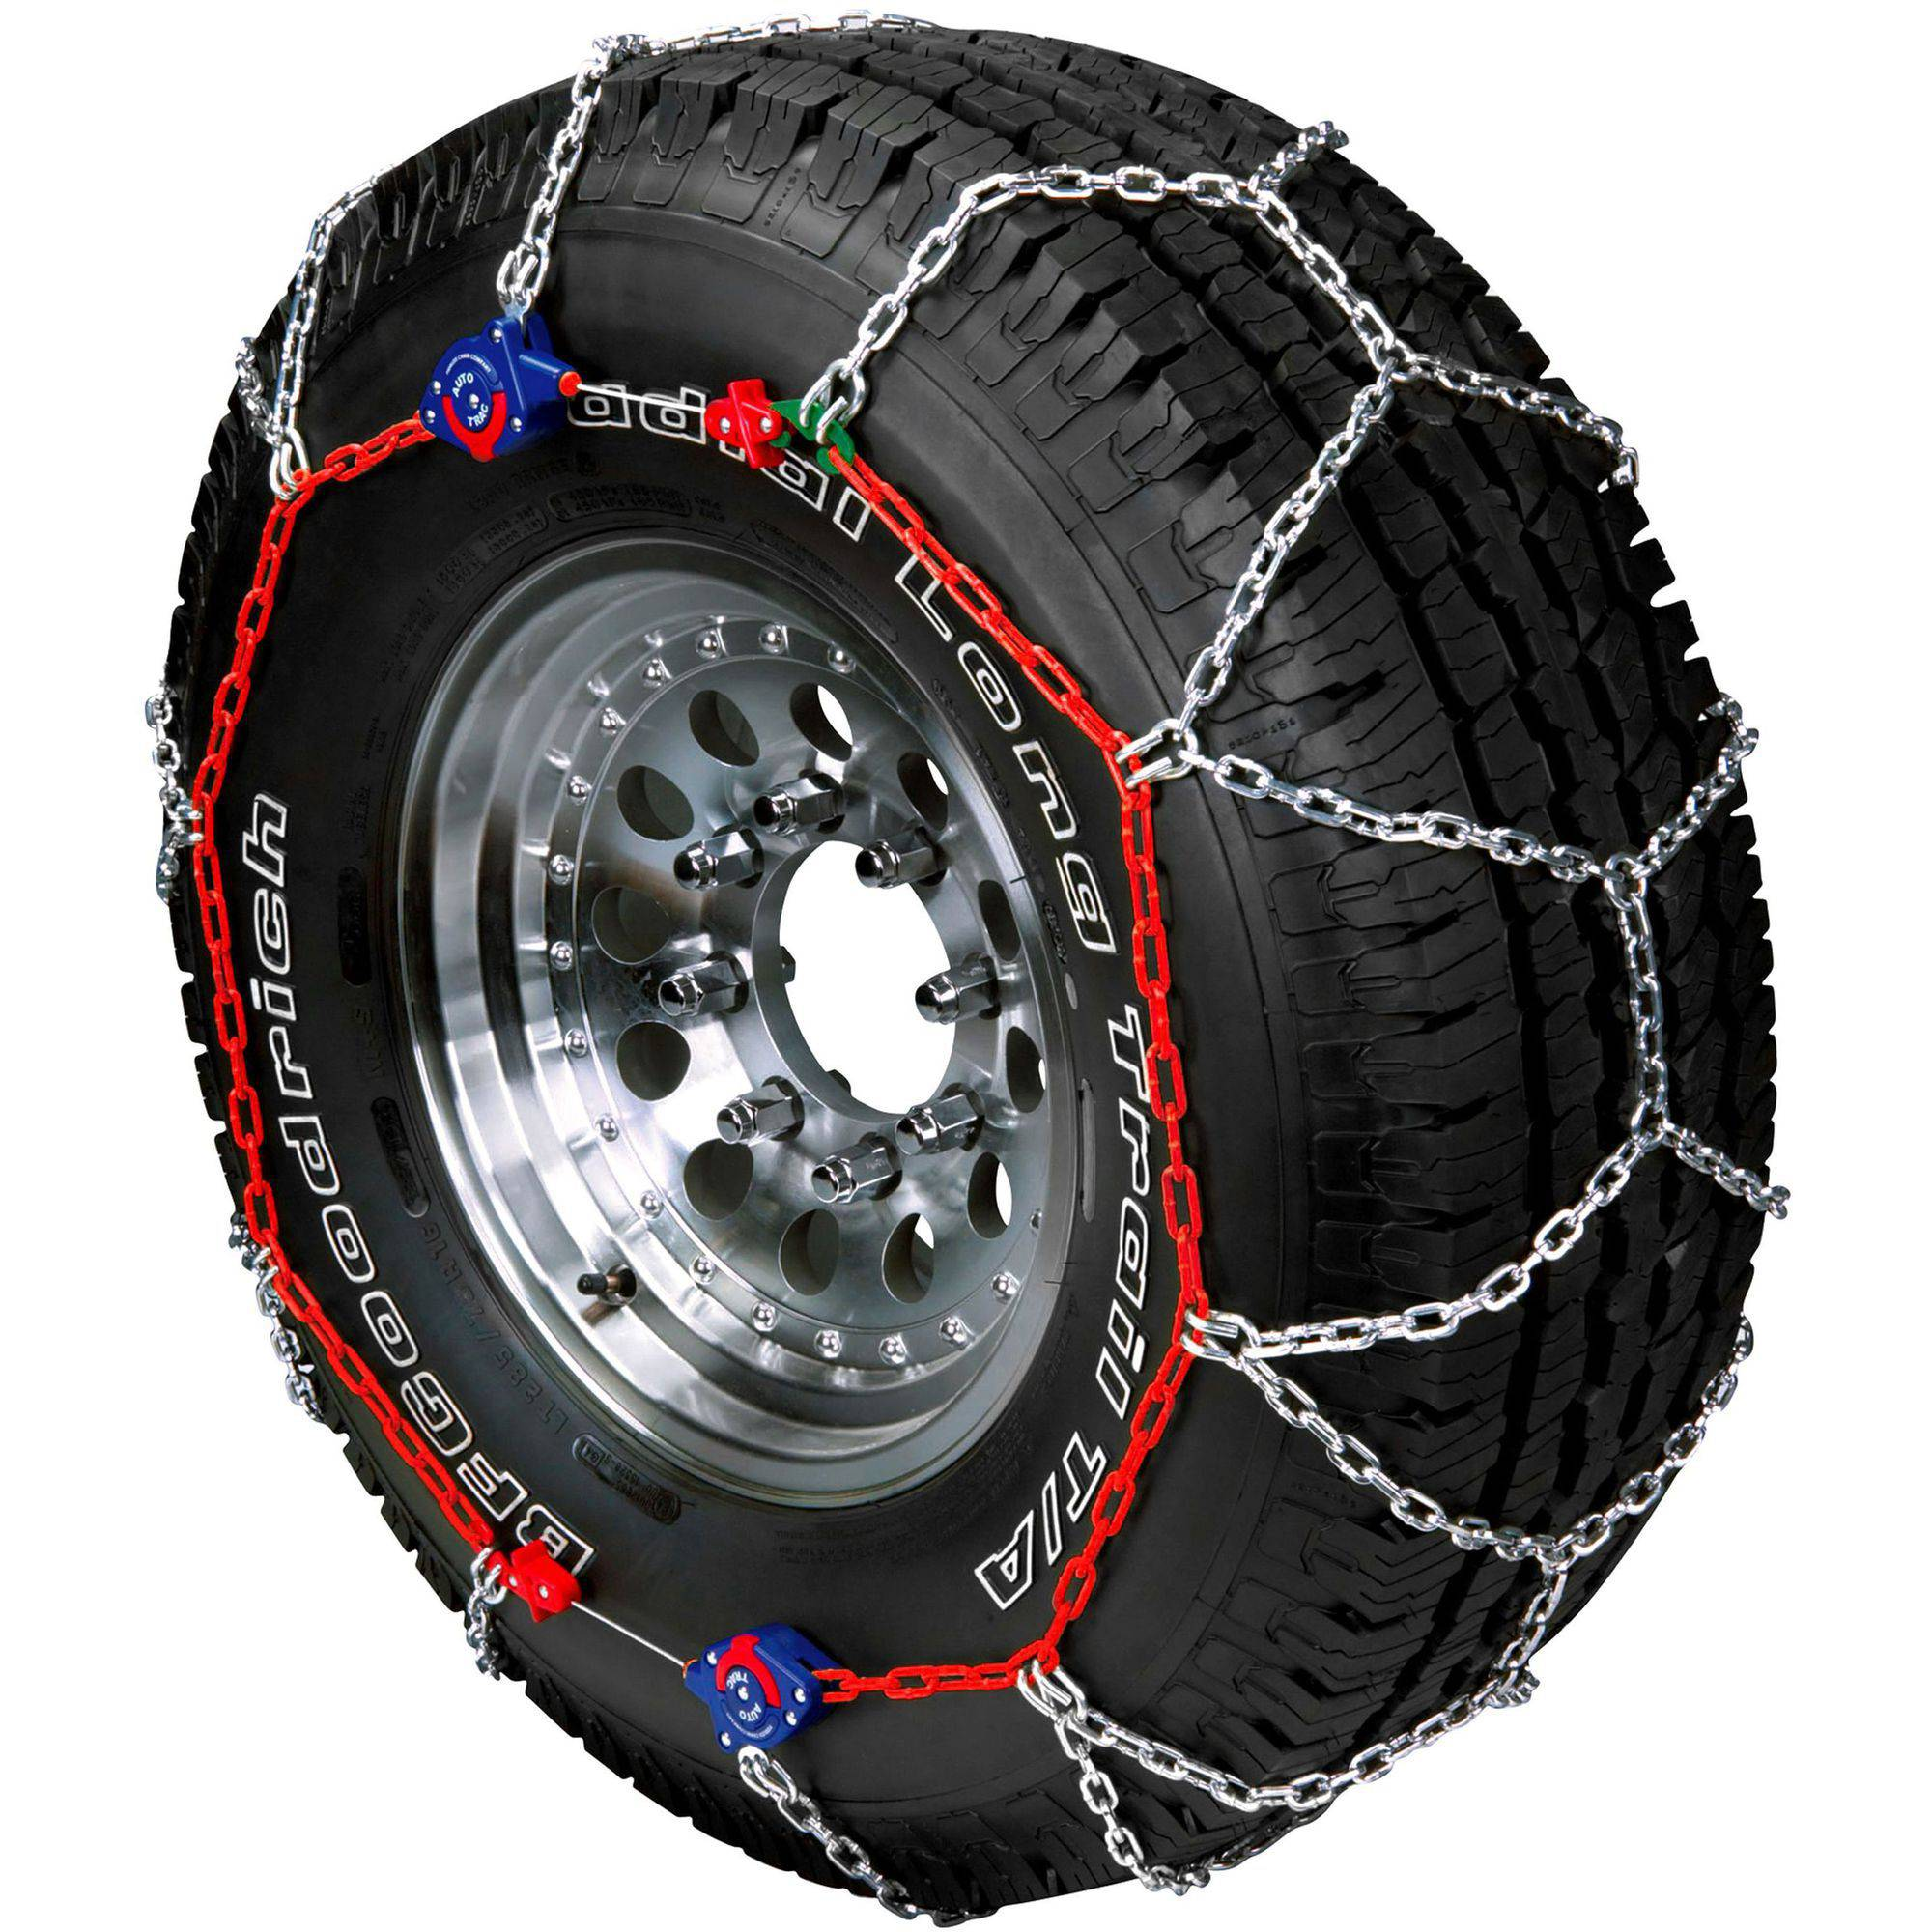 Peerless Chain AutoTrac Light Truck/SUV Tire Chains, #0232805